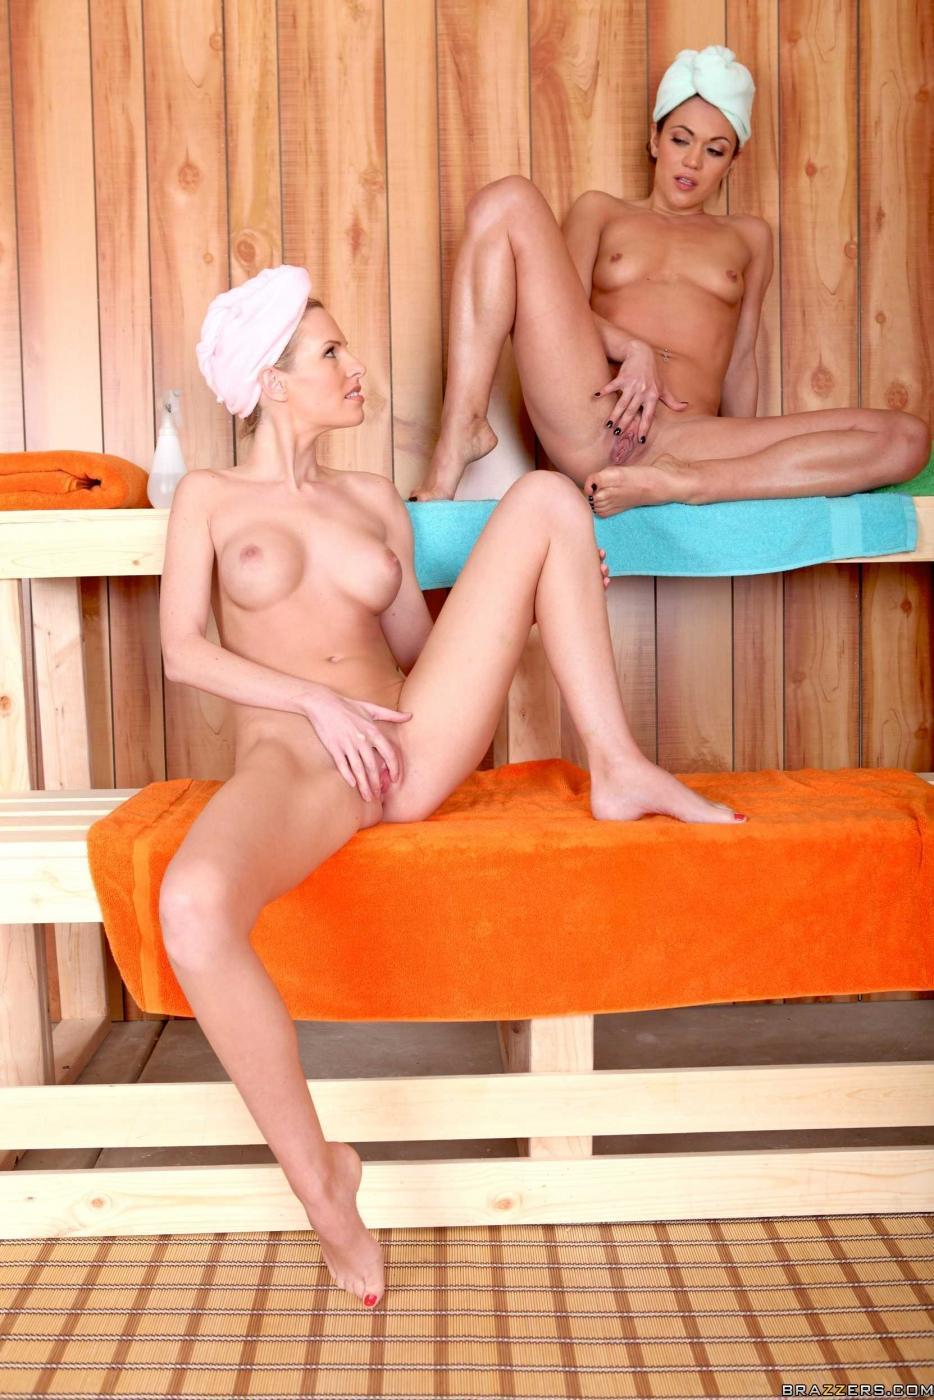 Милашки лесби Aimee Addison и Aimee Addison отлизывают друг другу в баньке